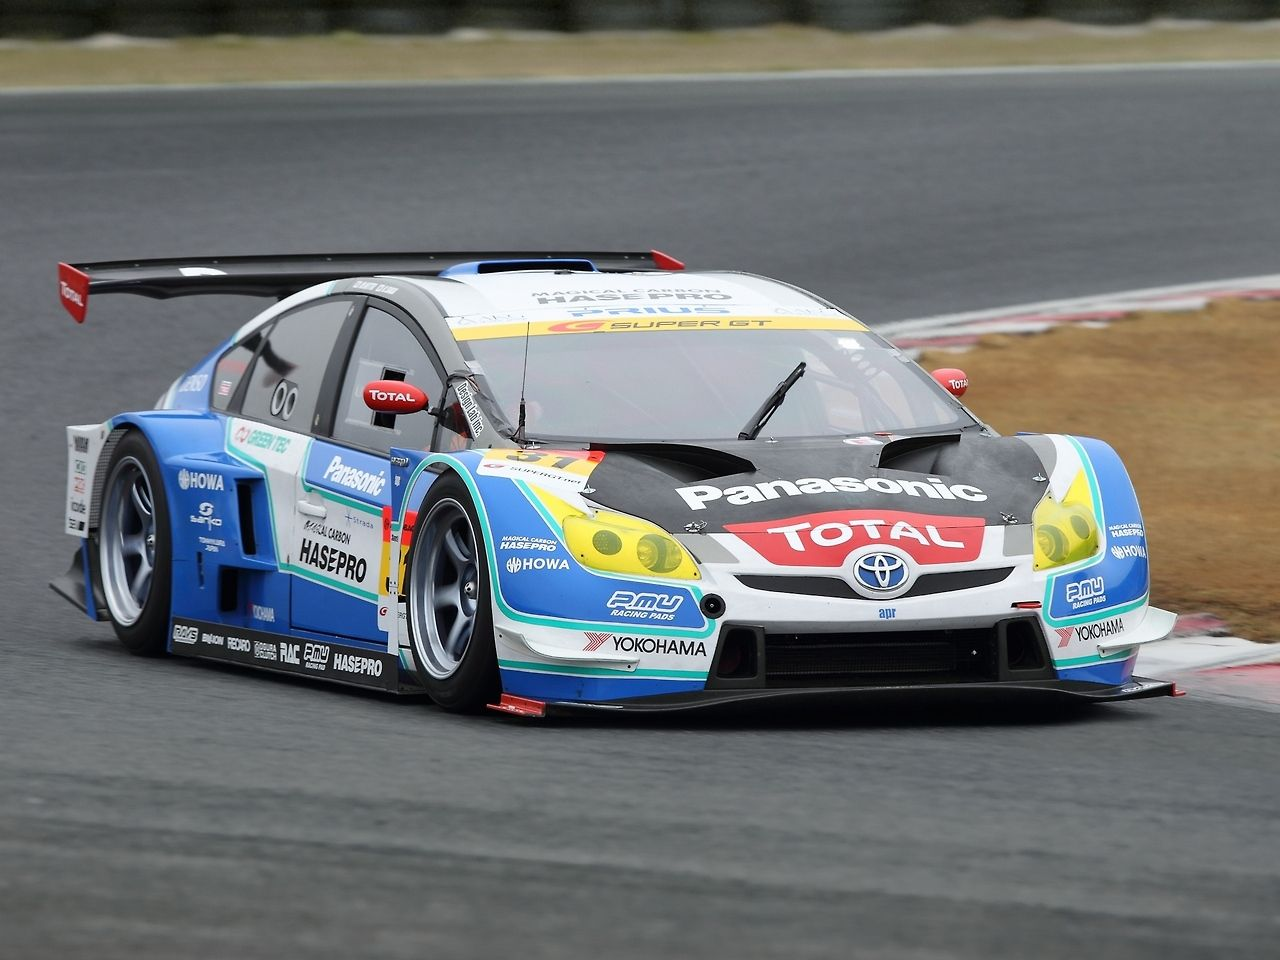 Toyota Prius Gt300 Race Car Racing Toyota Prius Race Cars